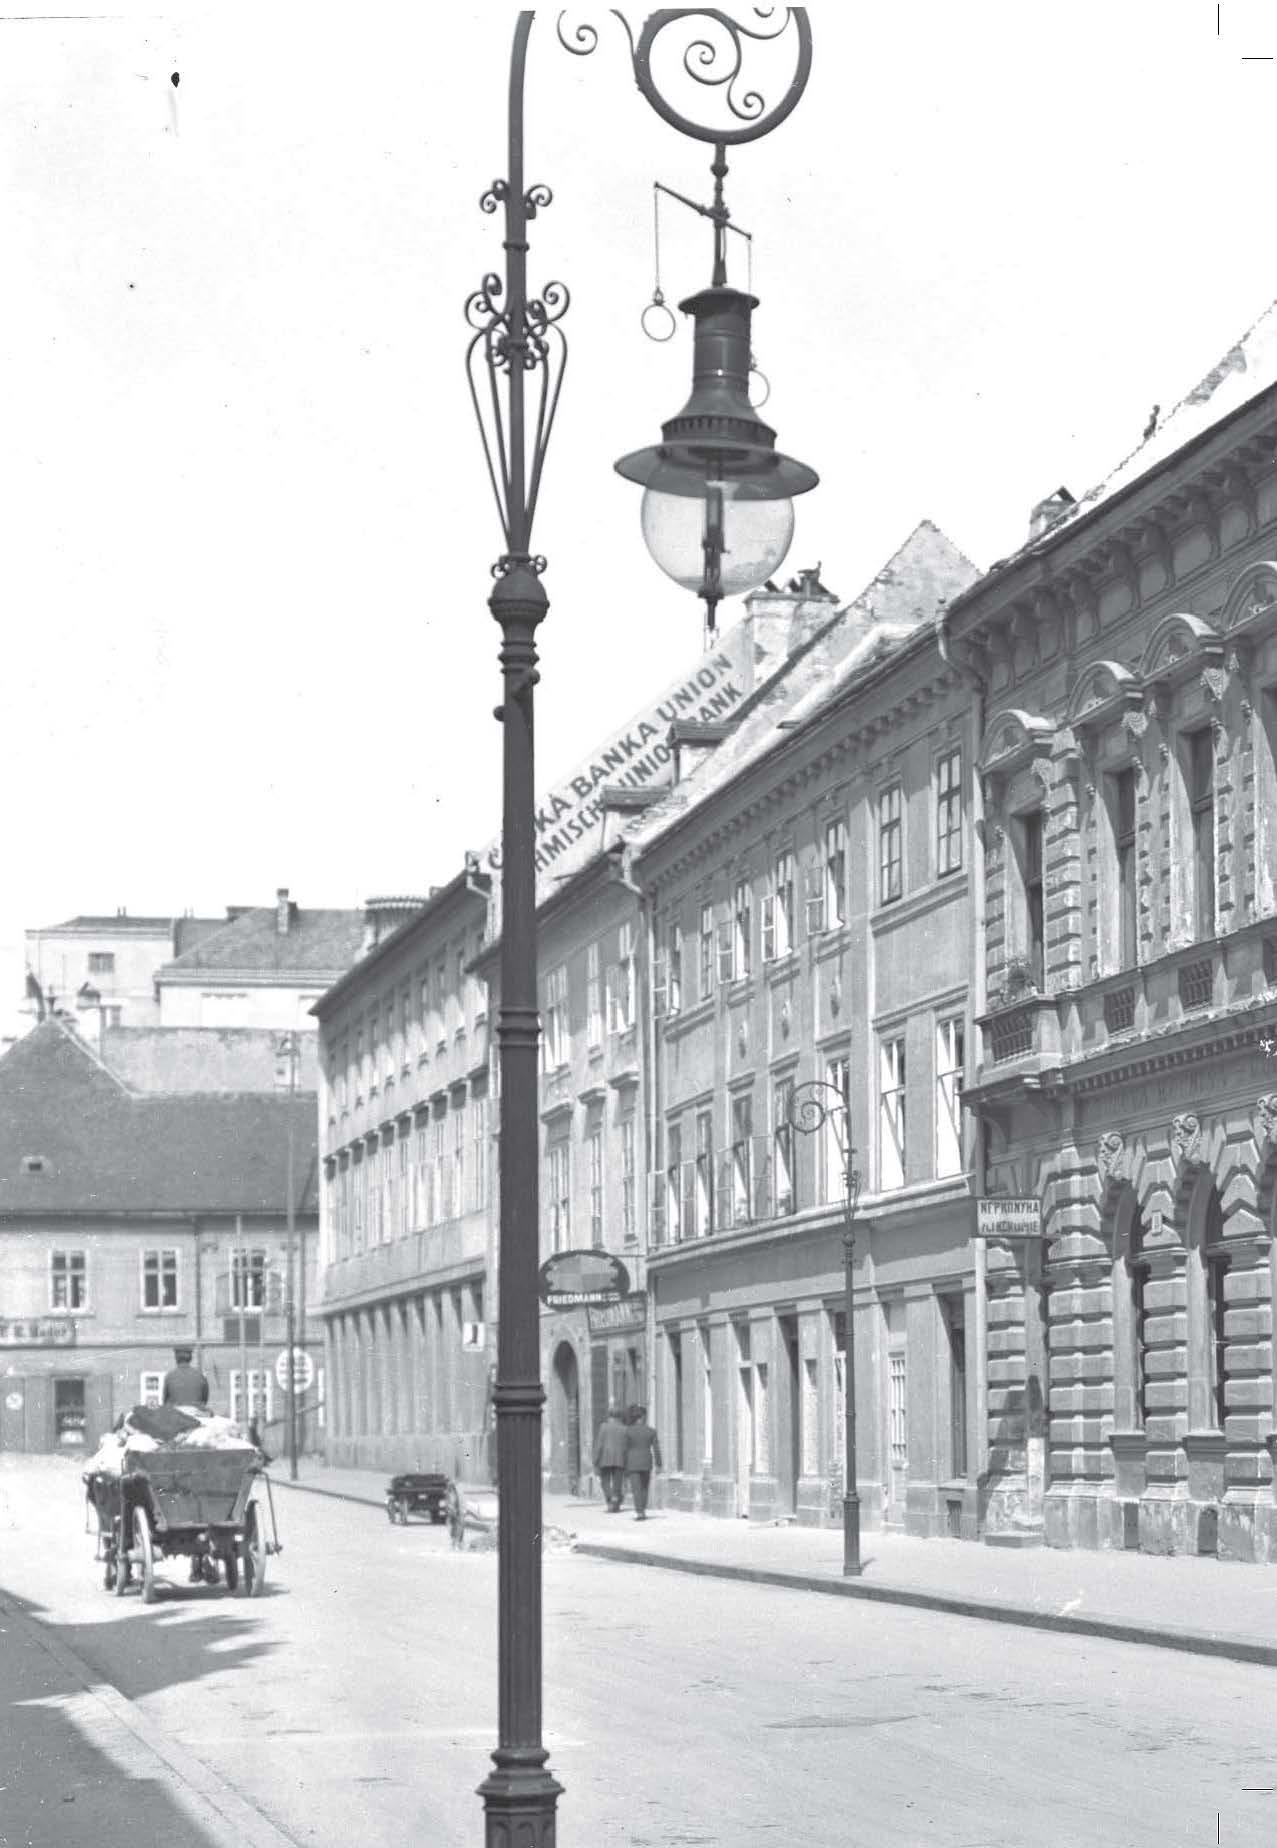 Lampy verejného osvetlenia v Bratislave 3